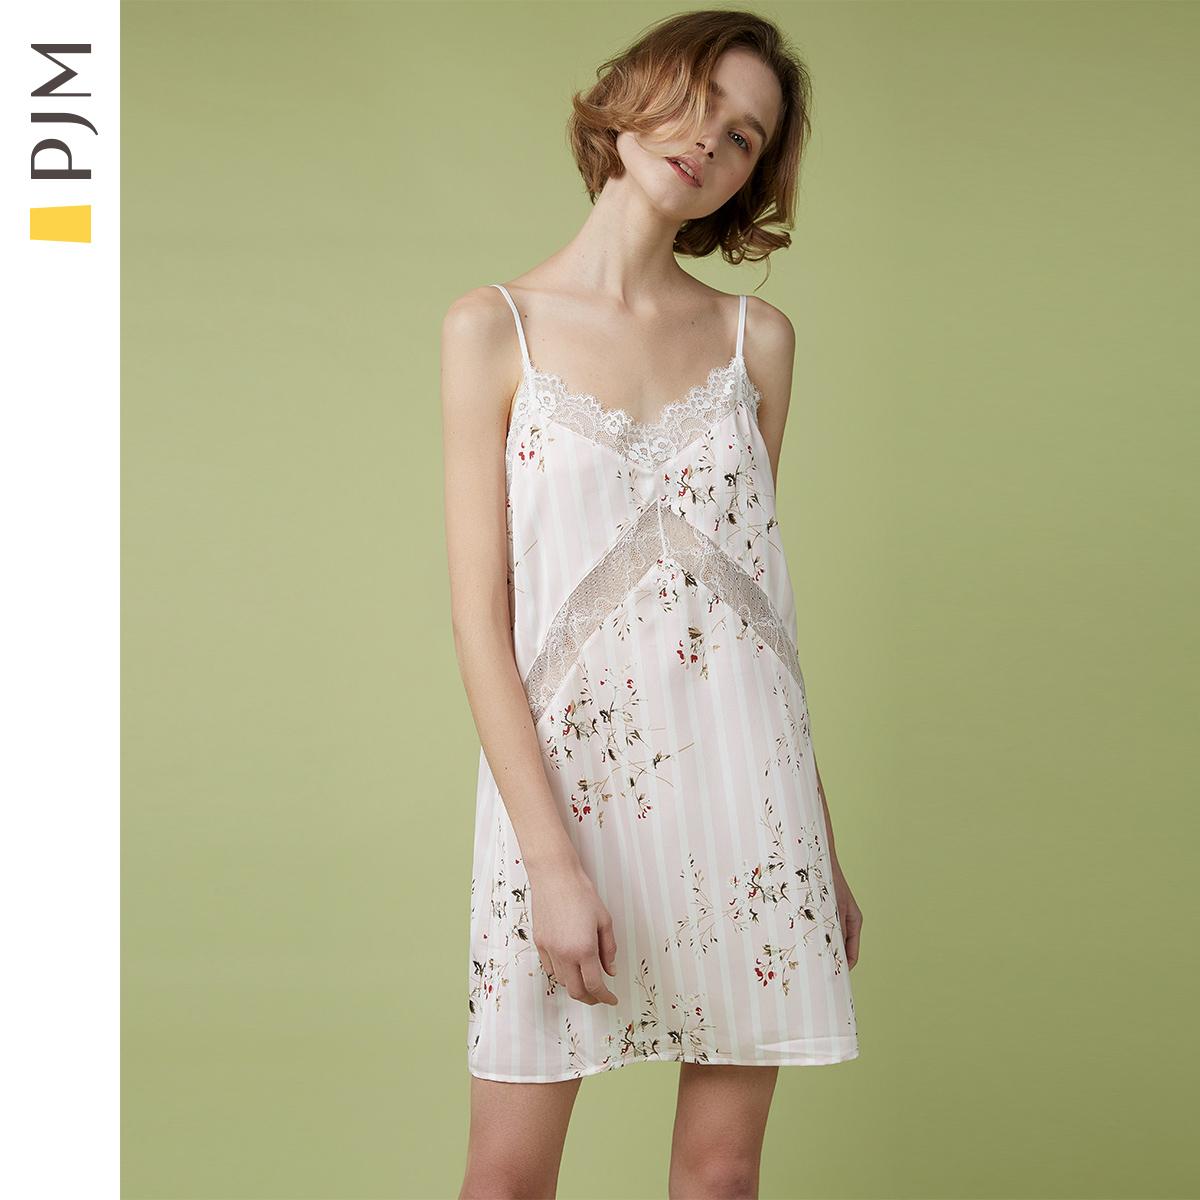 PJM睡裙女夏季性感冰丝吊带睡衣薄款蕾丝镂空可爱舒适家居服